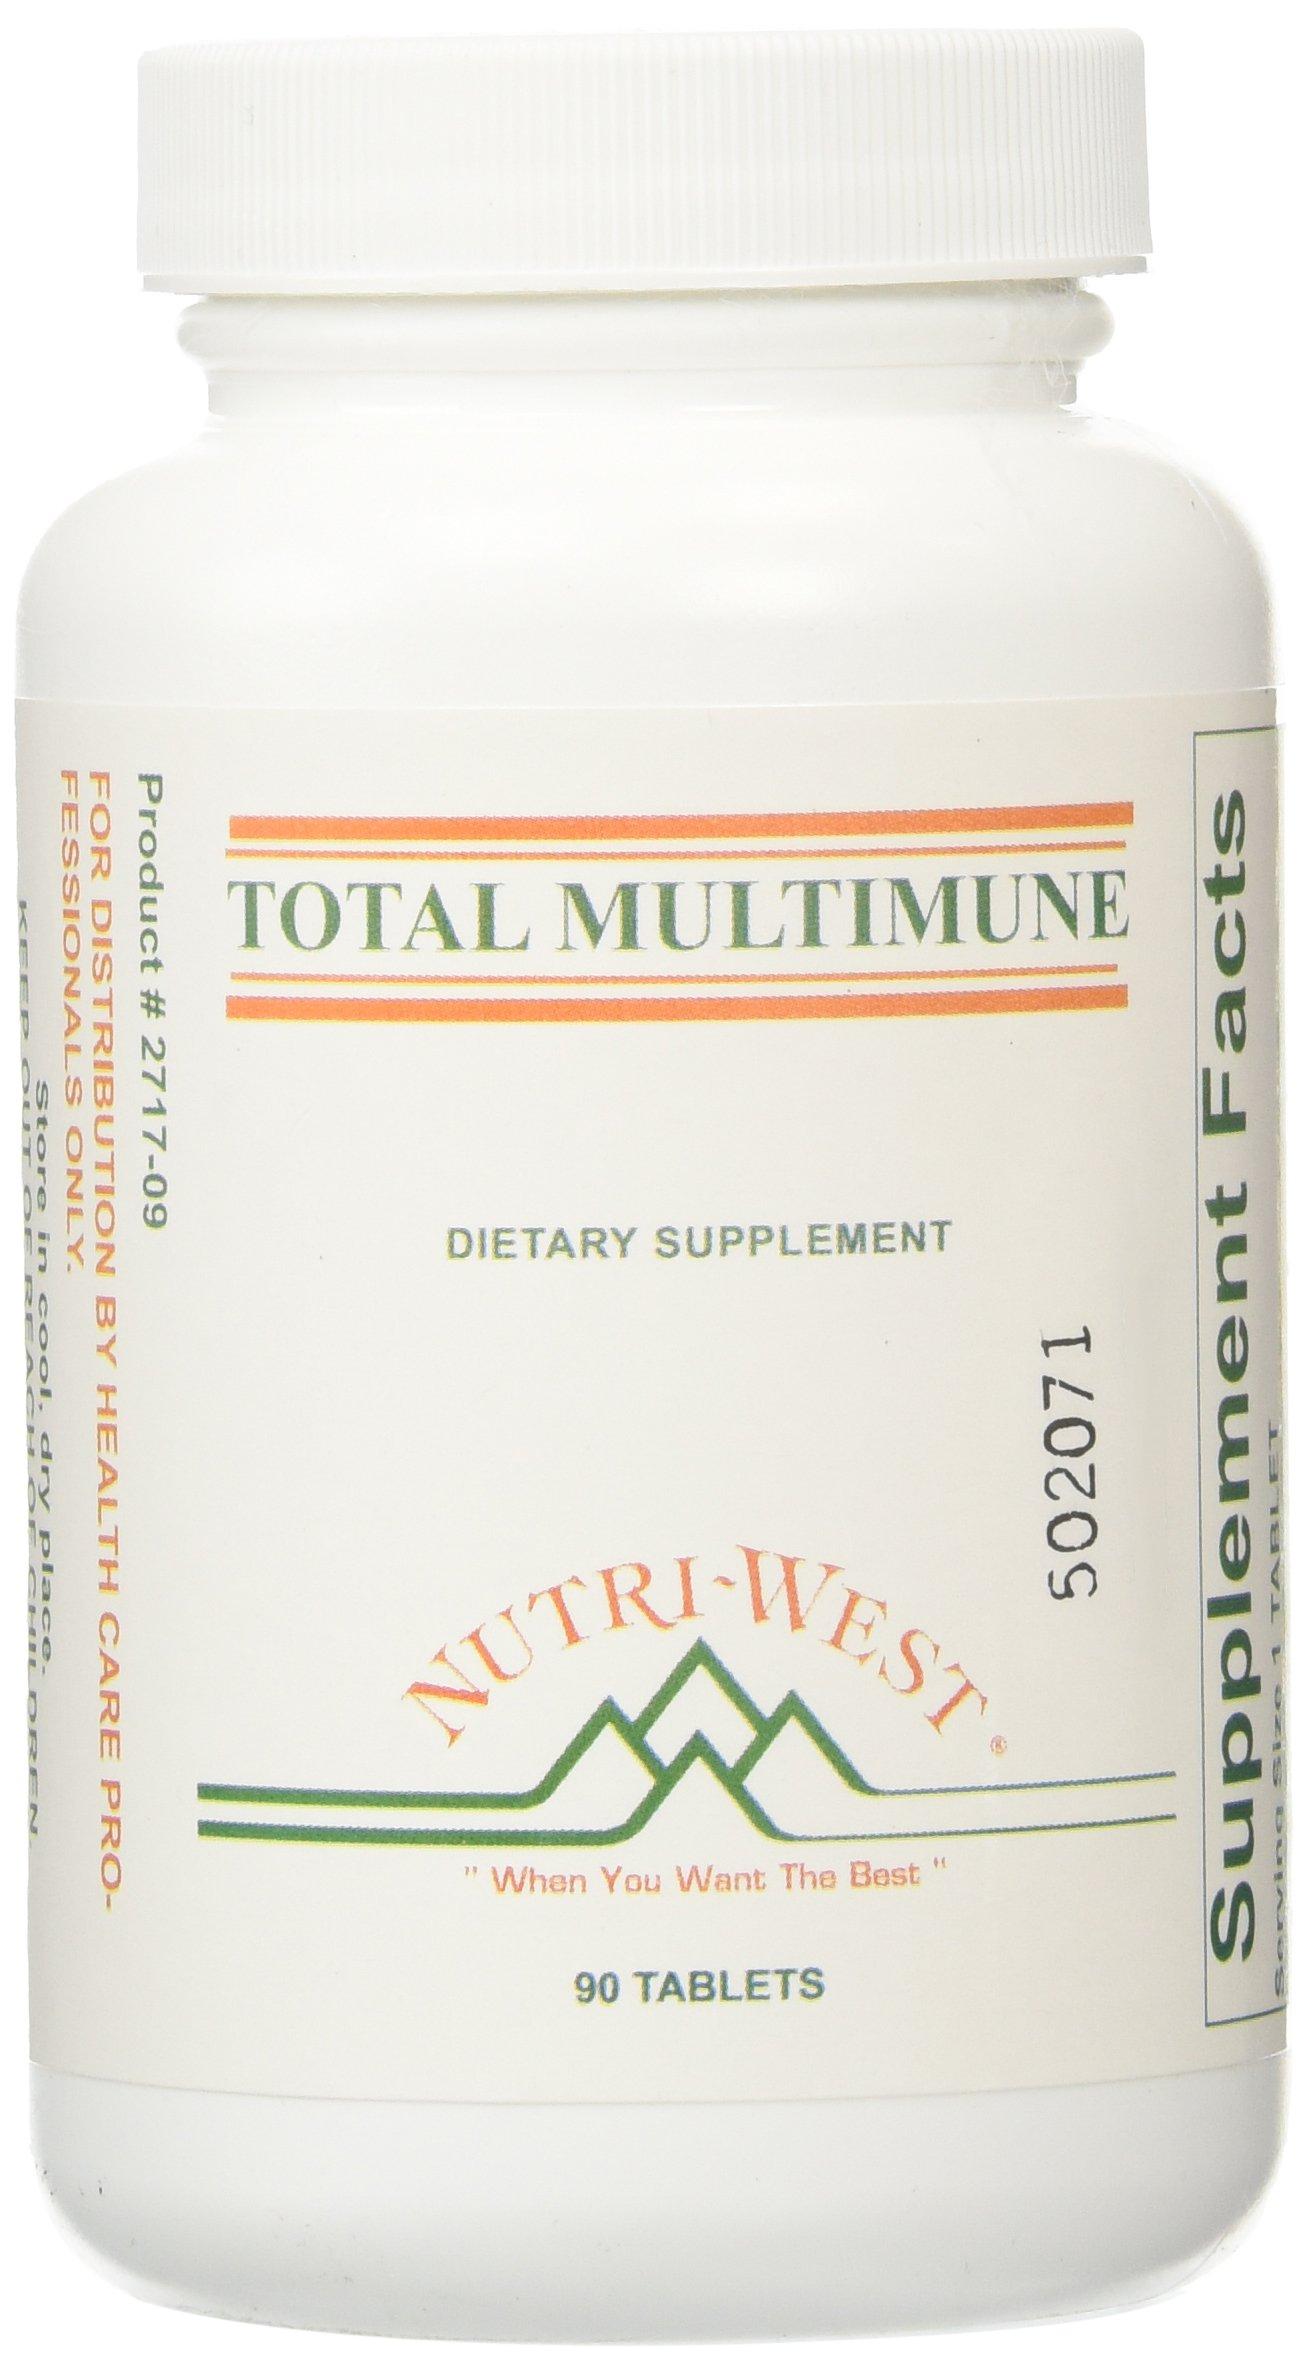 Nutri-West - TOTAL MULTIMUNE - 90 Tablets